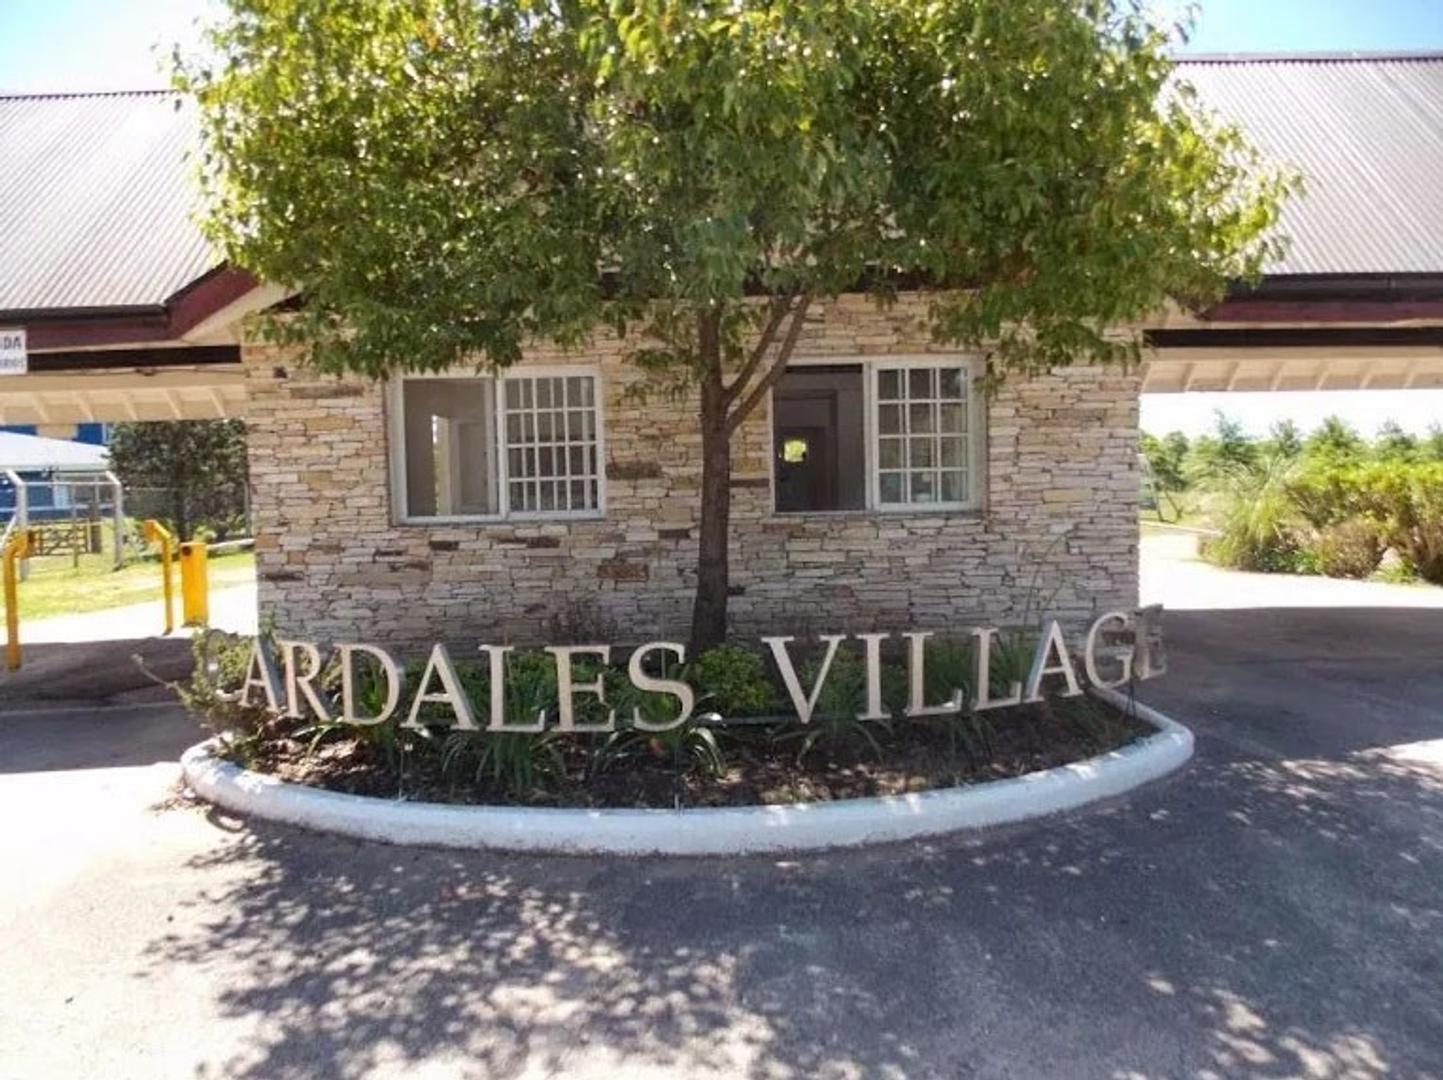 Cardales Village